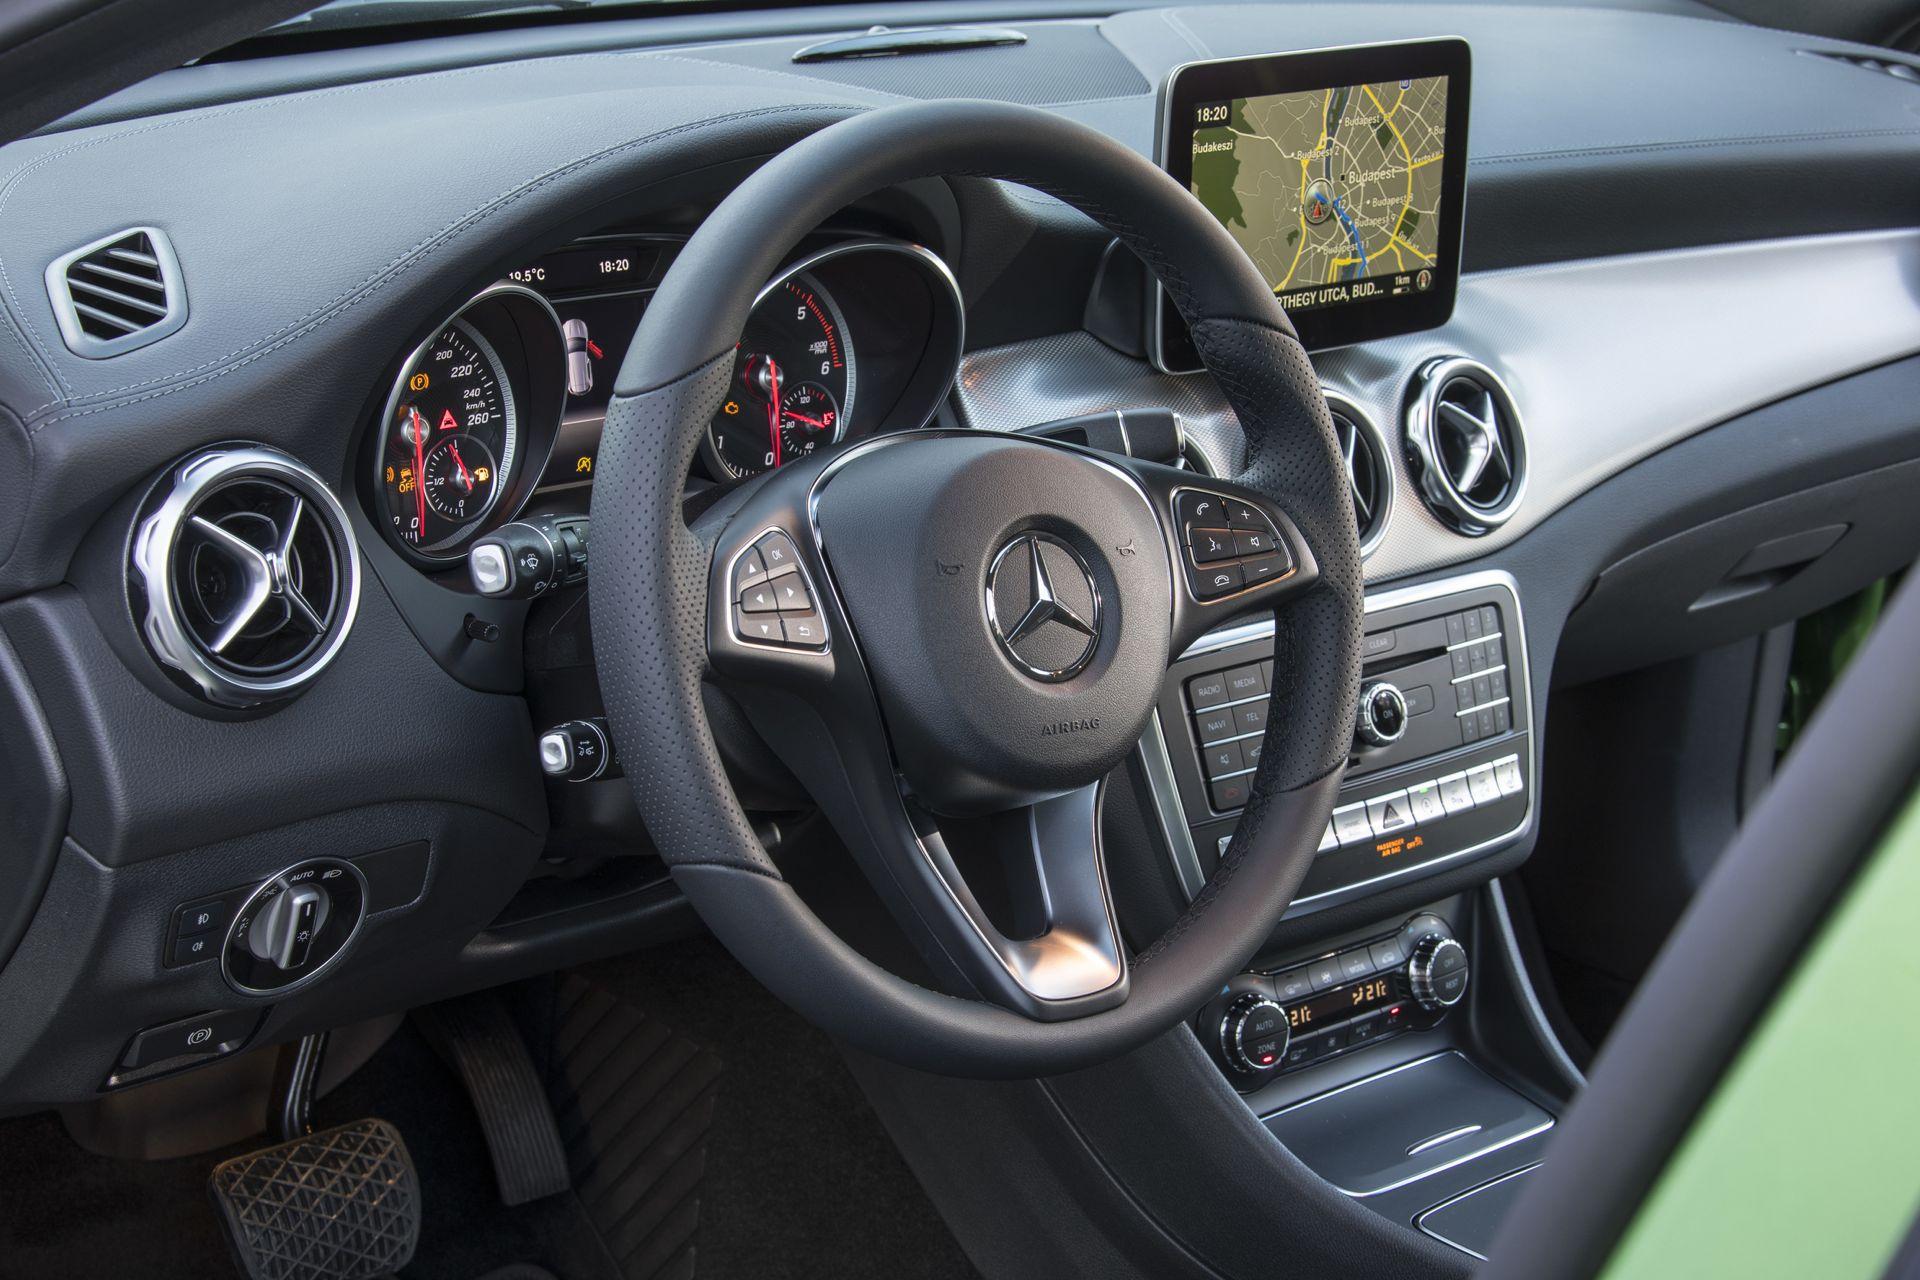 Mercedes-Benz GLA Cockpit